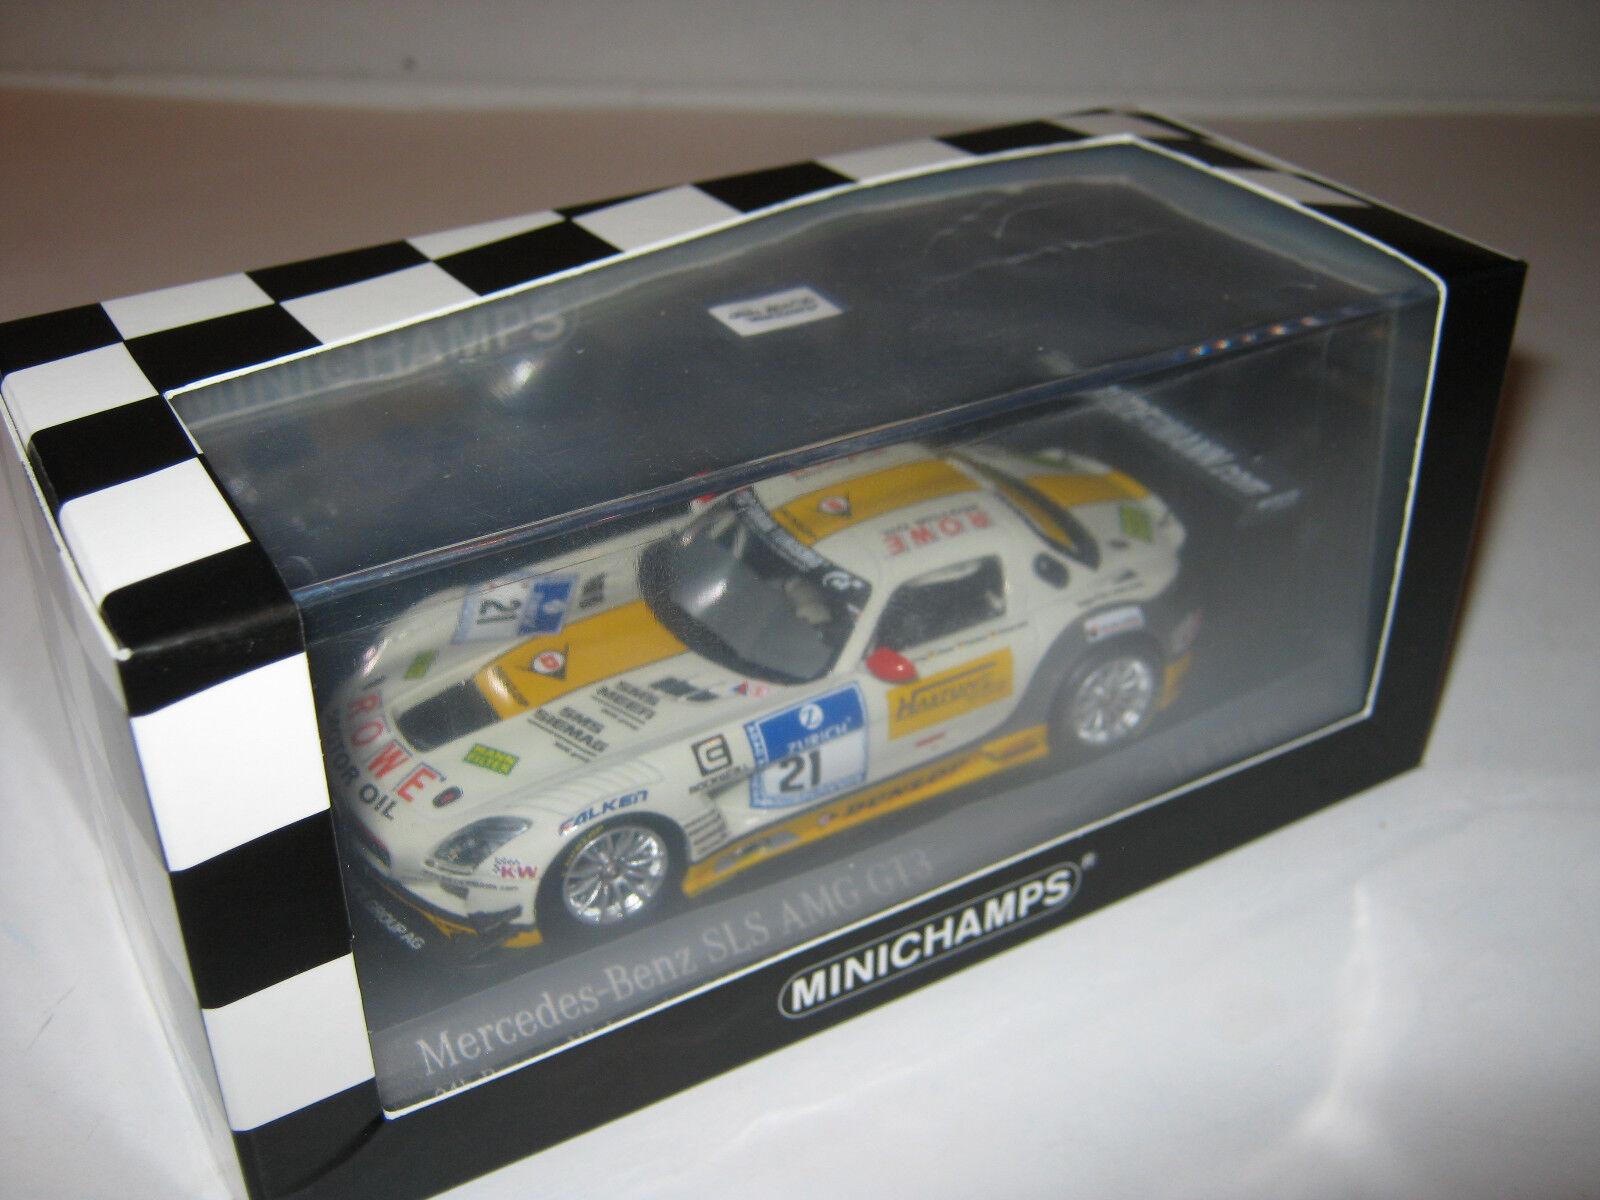 1 43 Mercedes SLS AMG gt3 Hartung Heyer Caoutchouc Nitrile butadiène. 2013 410133221 Minichamps NEW